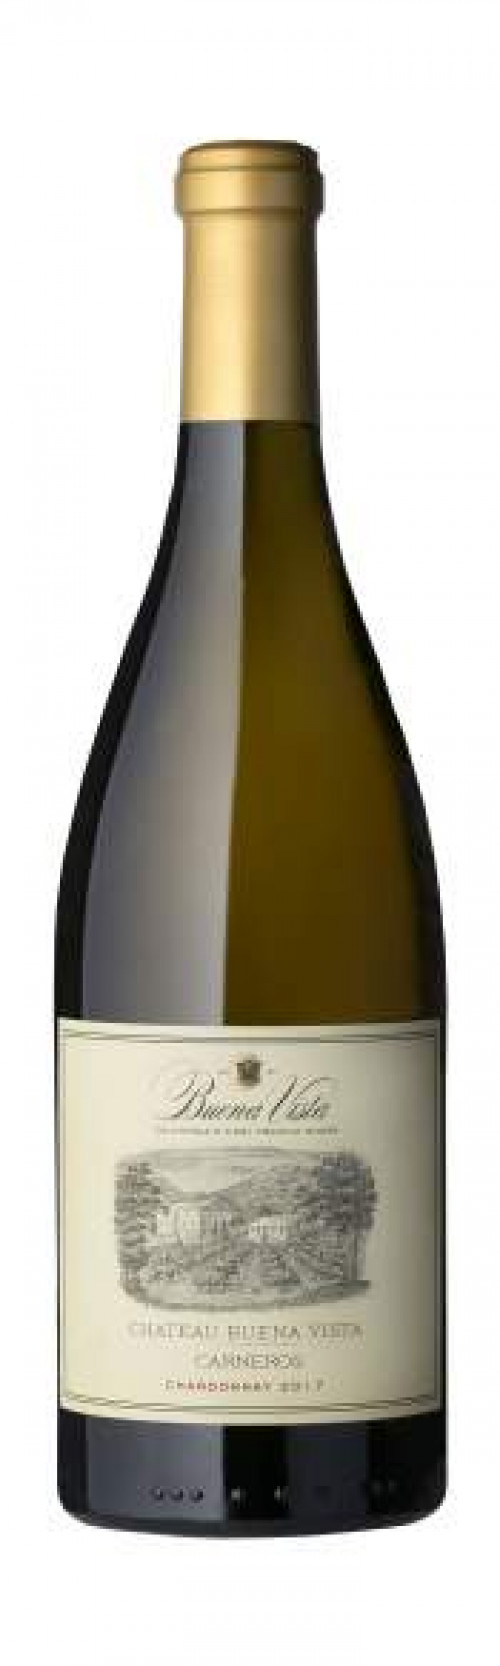 2017 Buena Vista Chateau Buena Vista Carneros Chardonnay 750Ml